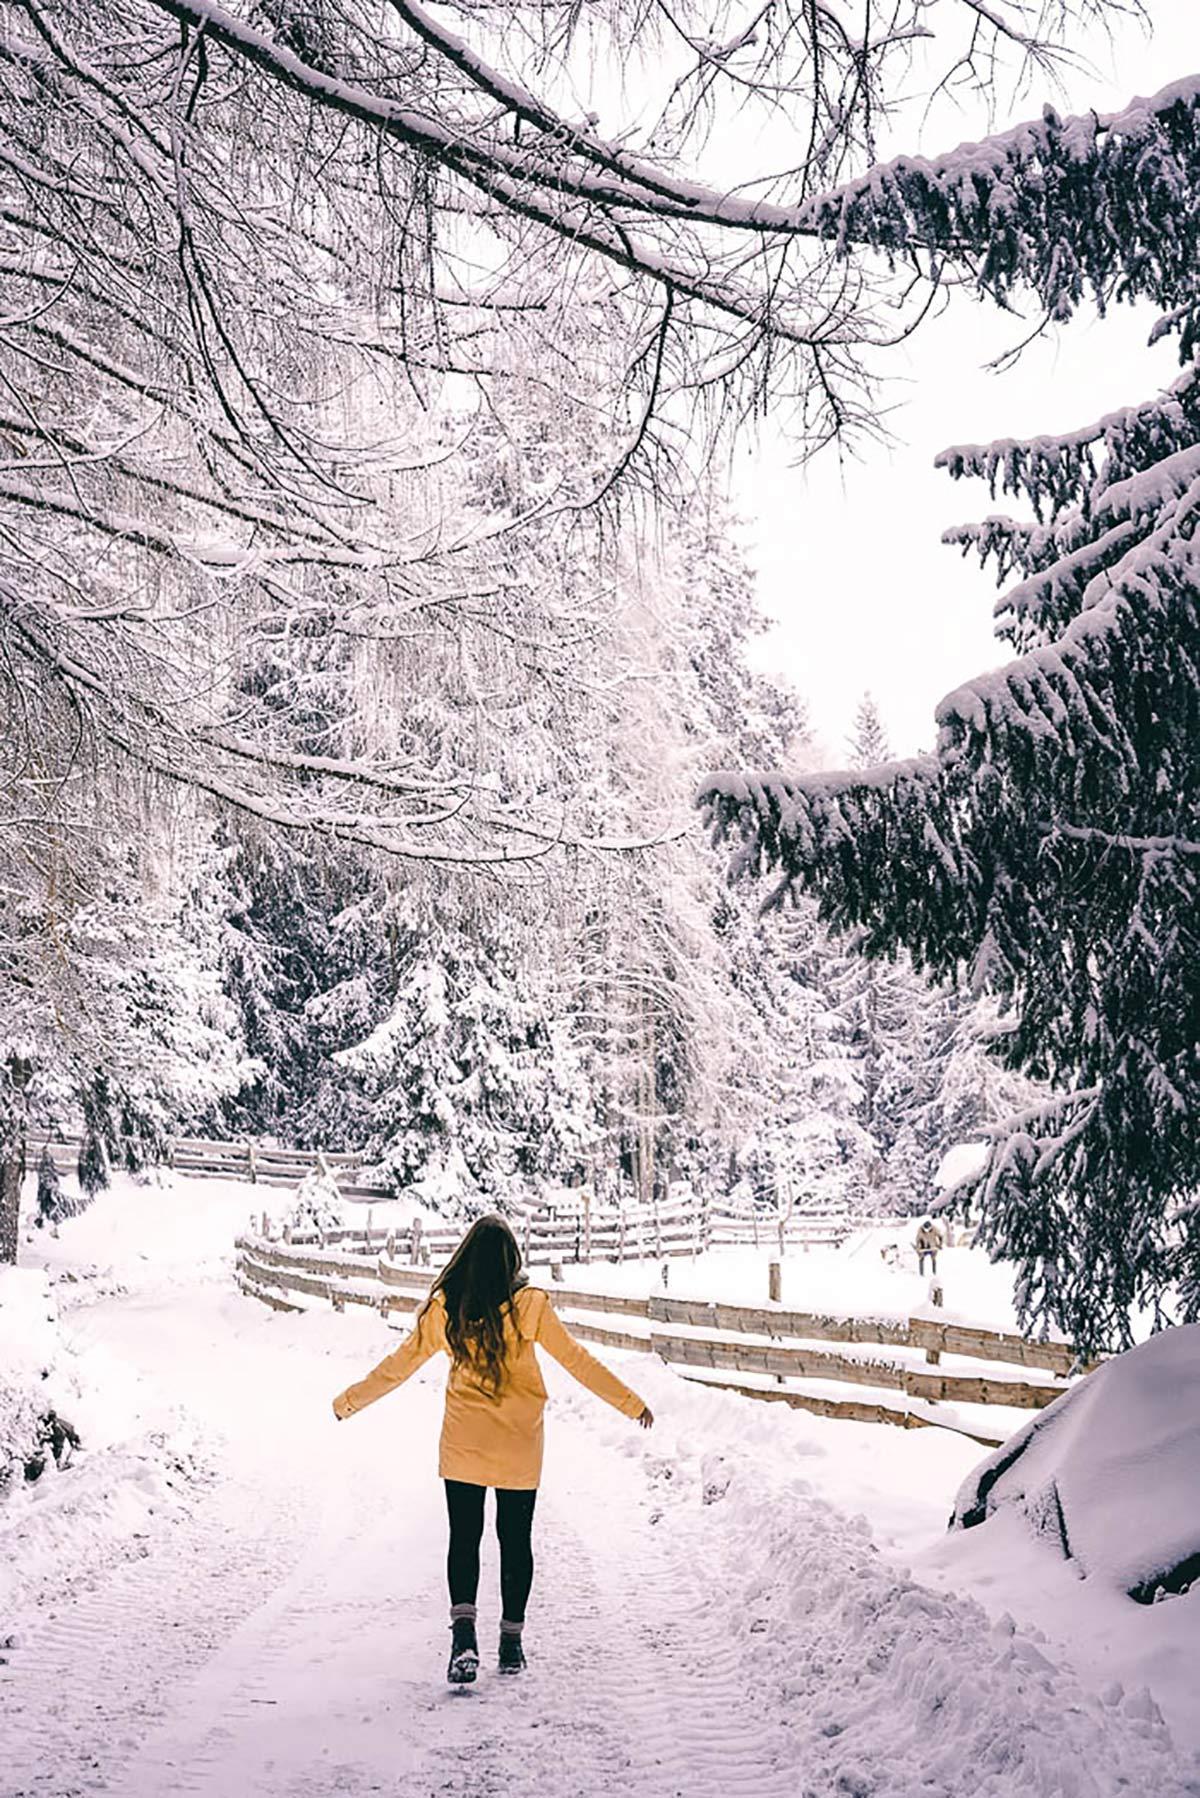 Südtiroler Winter Christine Neder